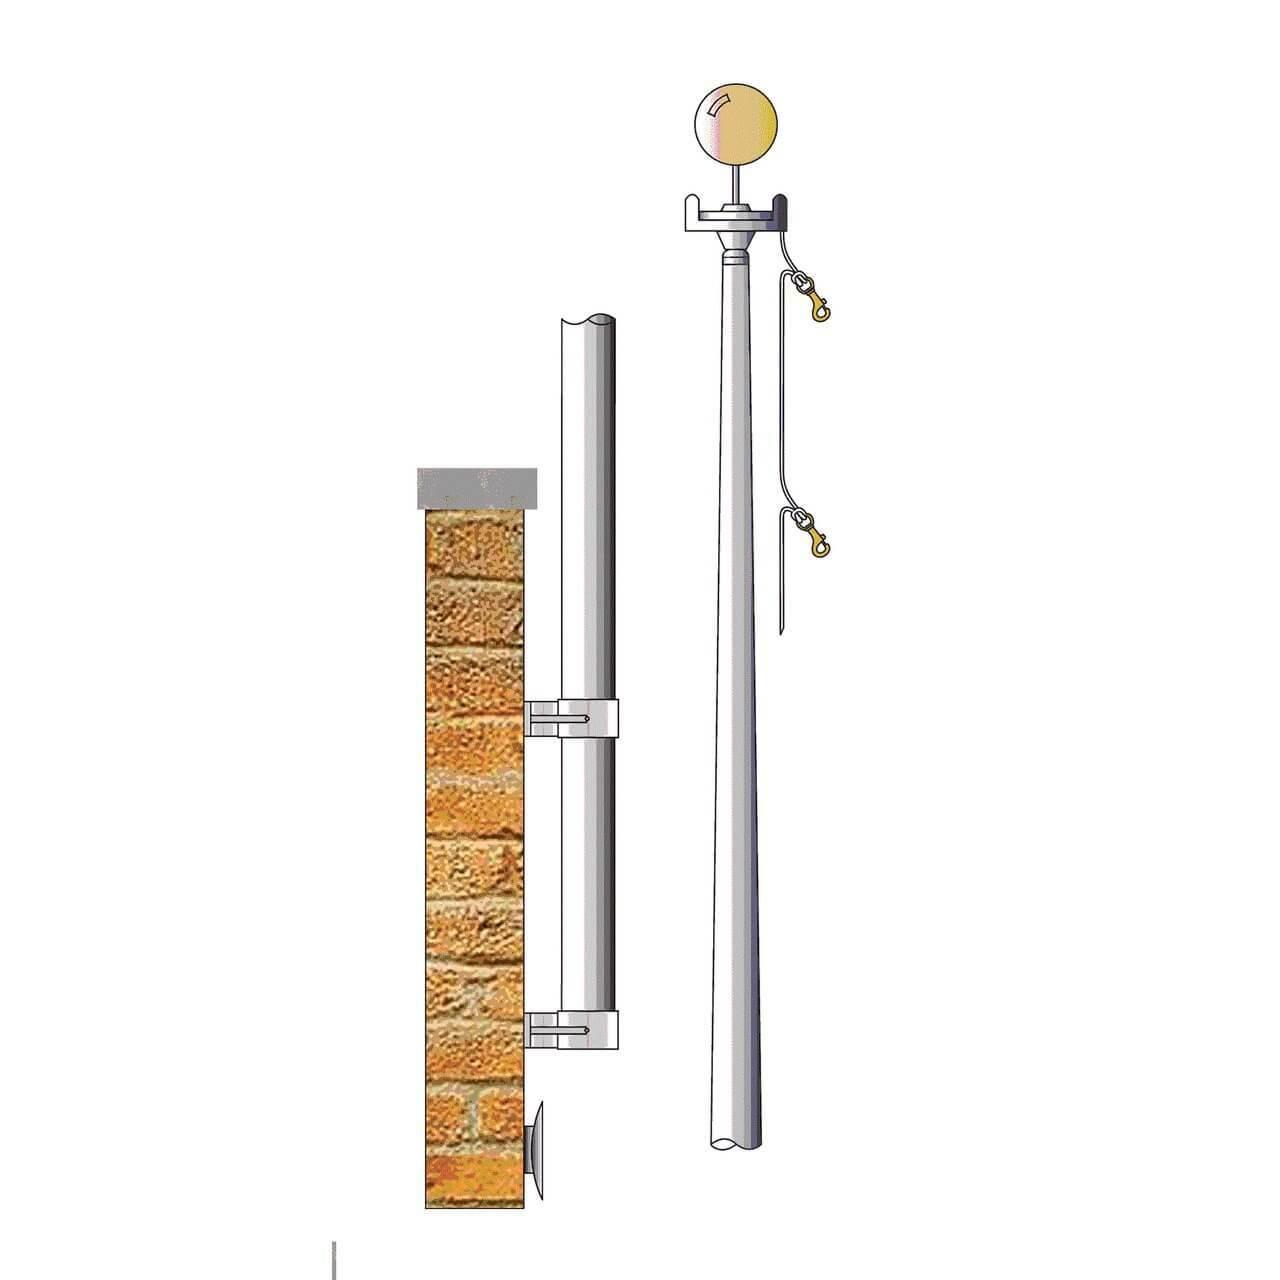 10 Vertical Wall Mounted Flagpole HVS10